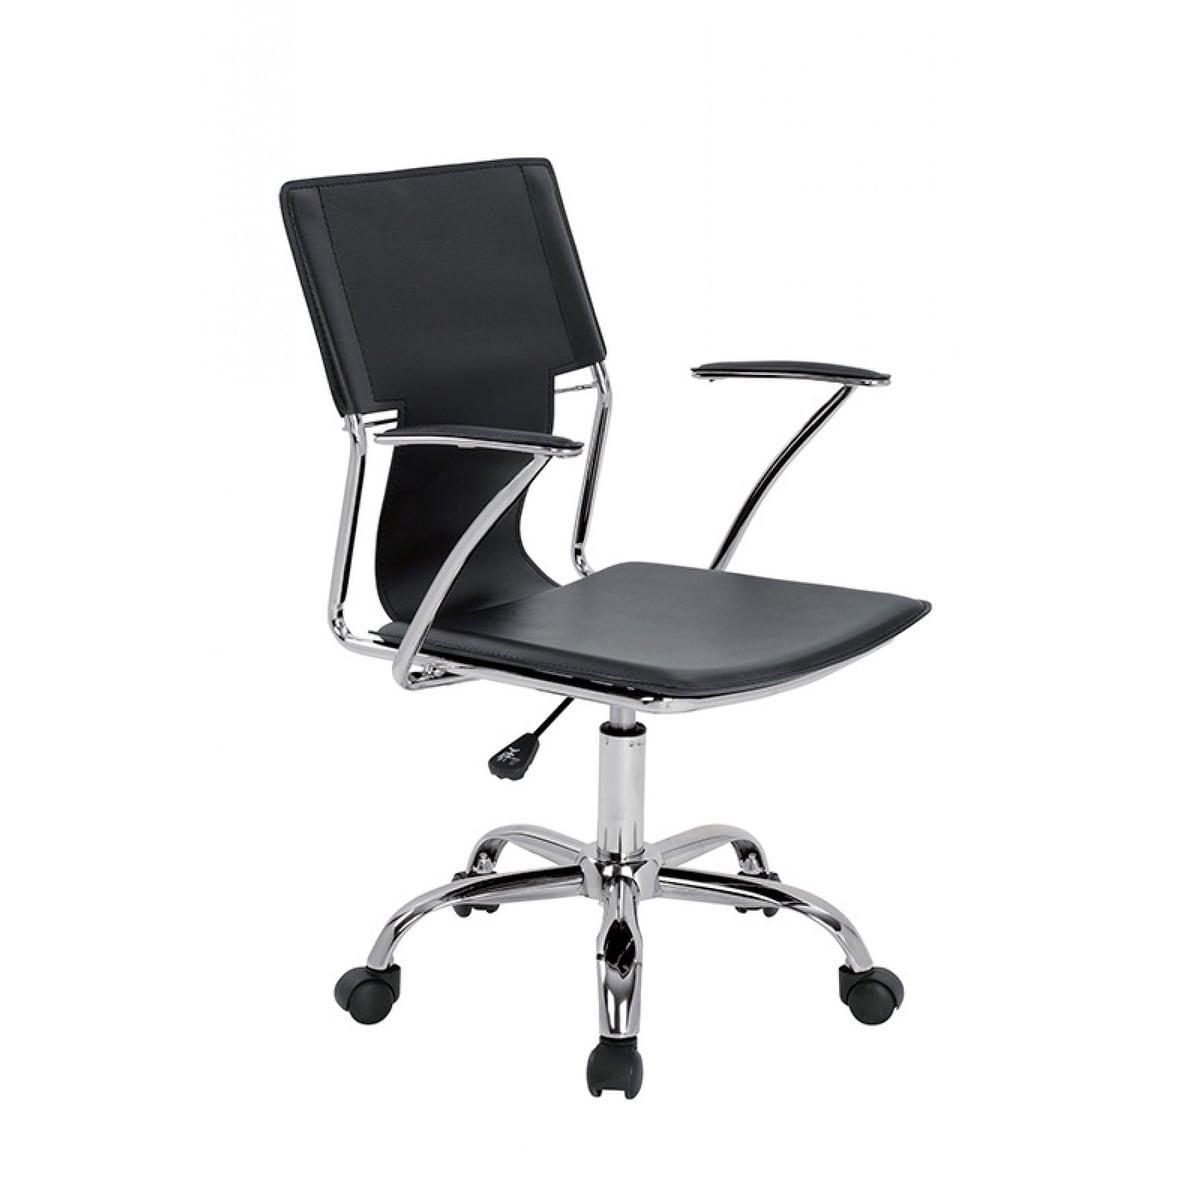 Emery Modern Adjustable Office Chair